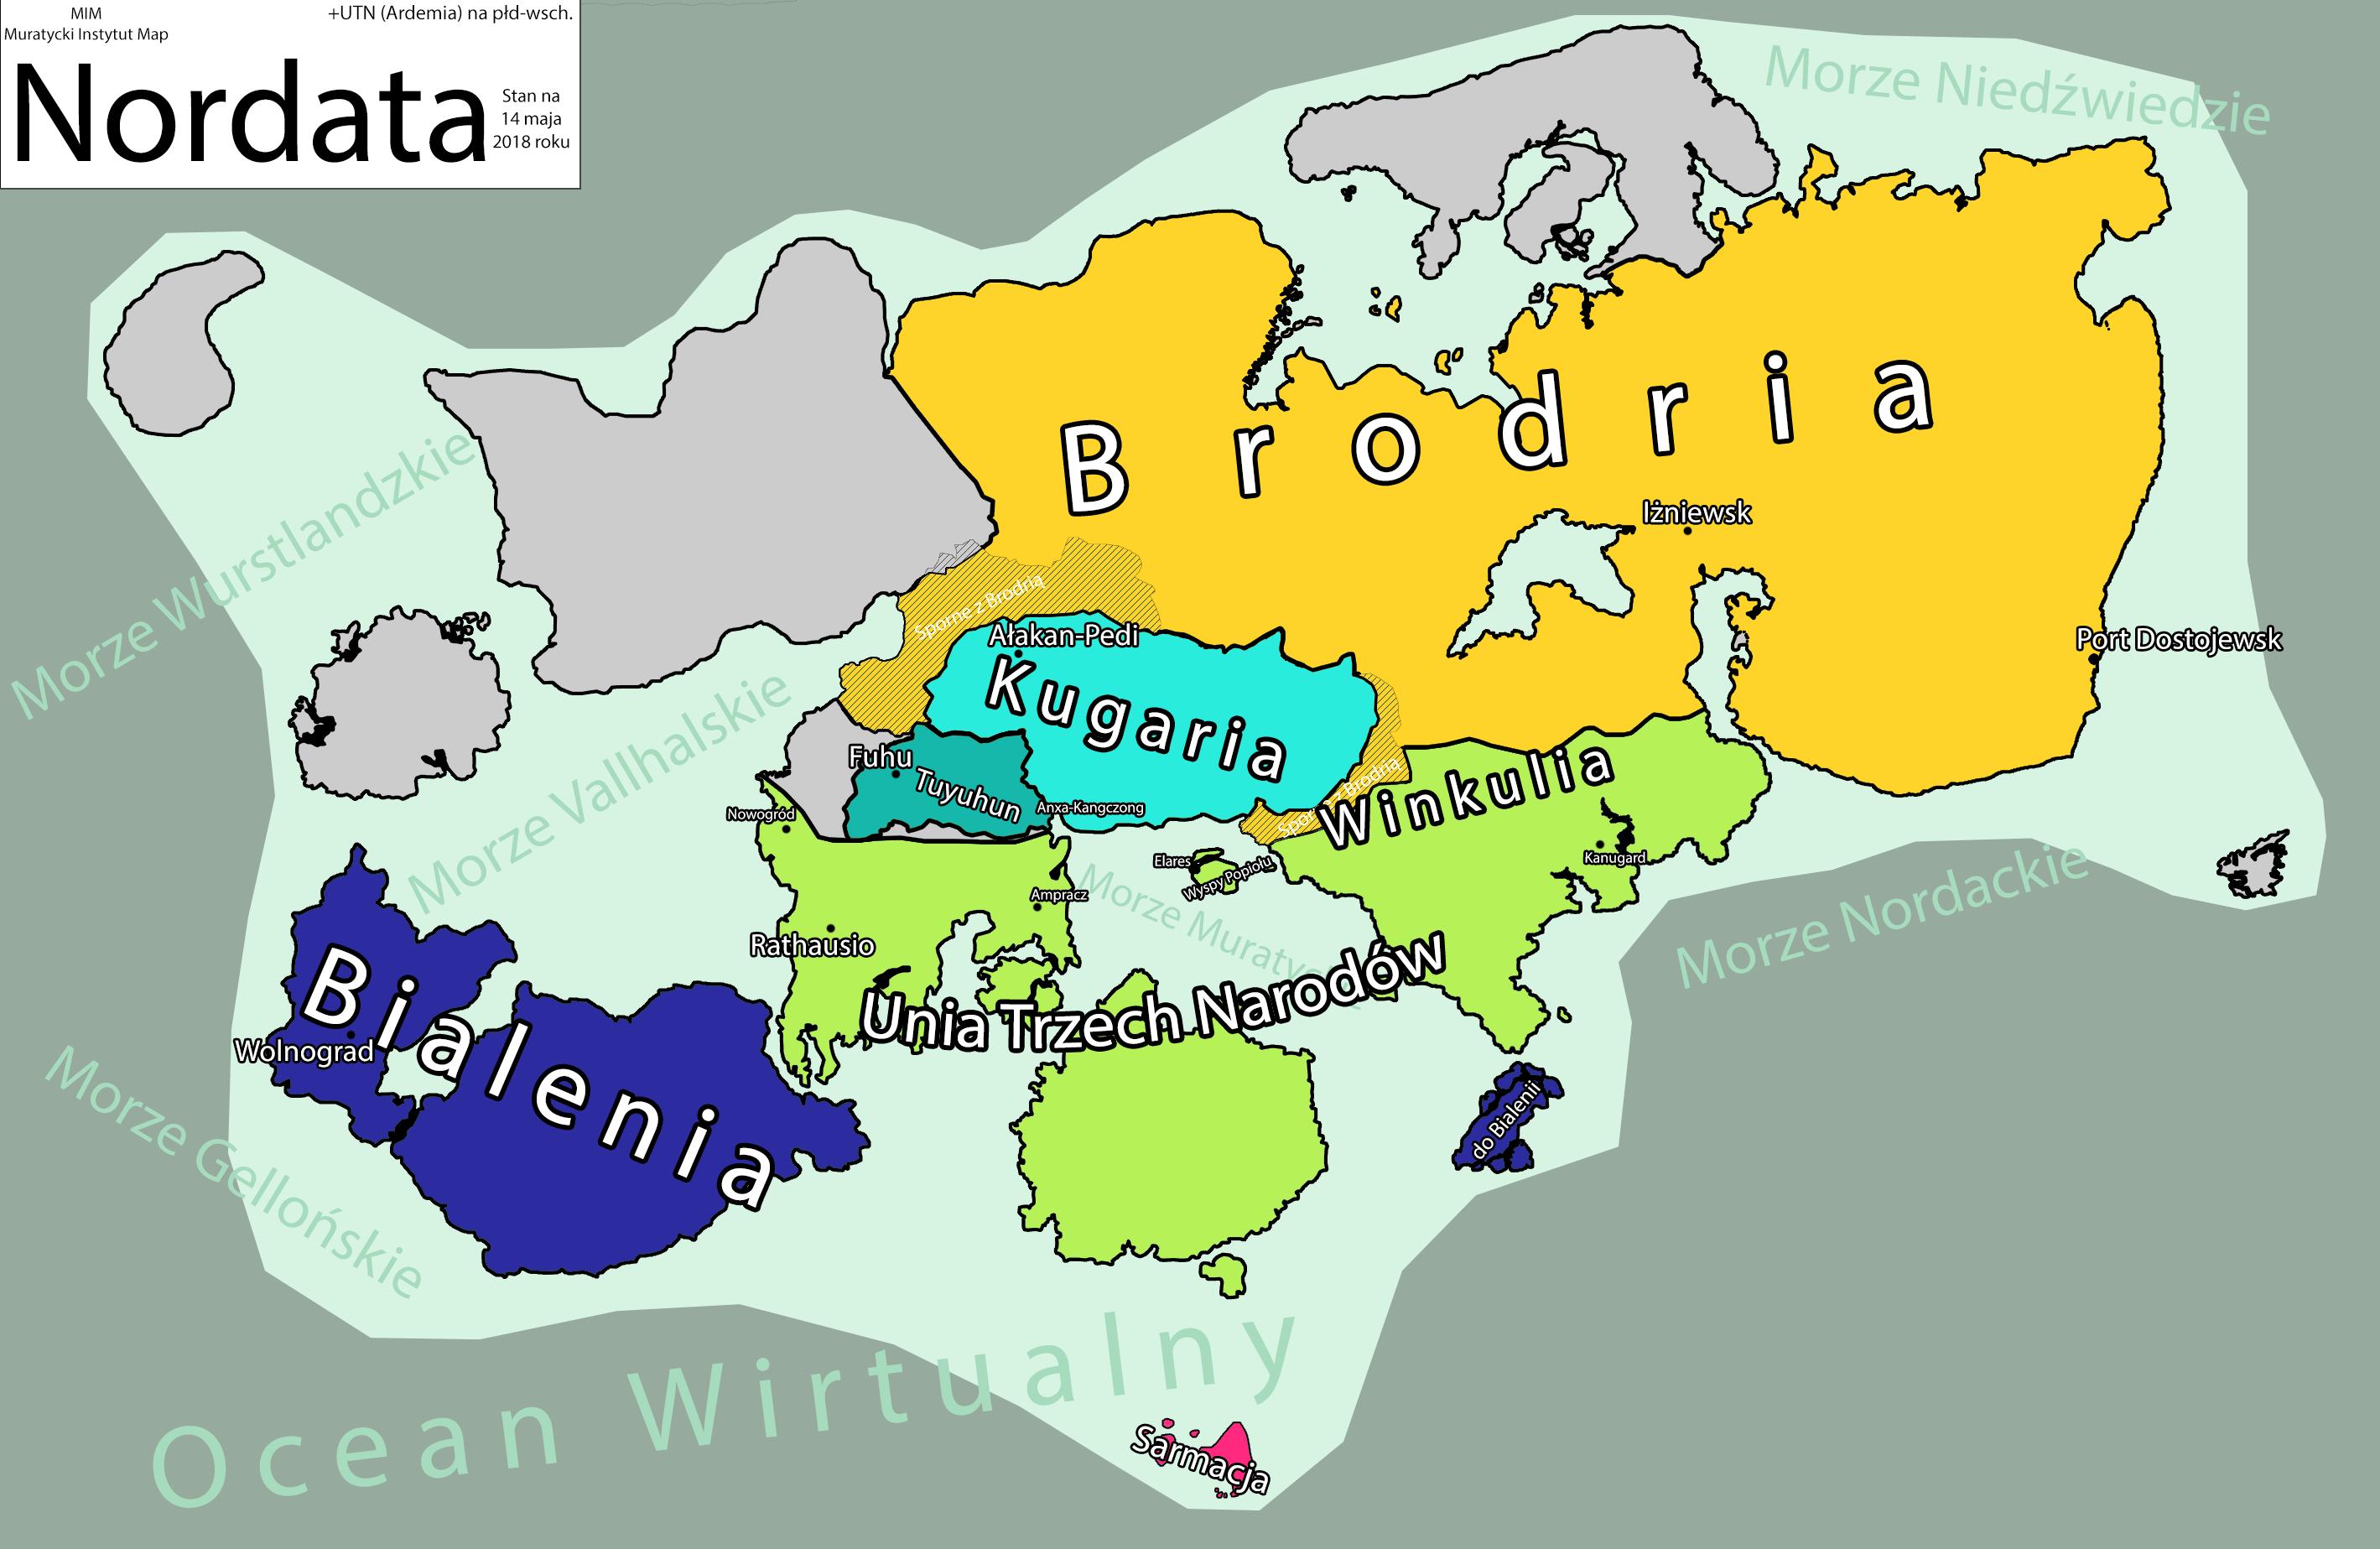 [Obrazek: Mapa_Nordaty_140518.png]